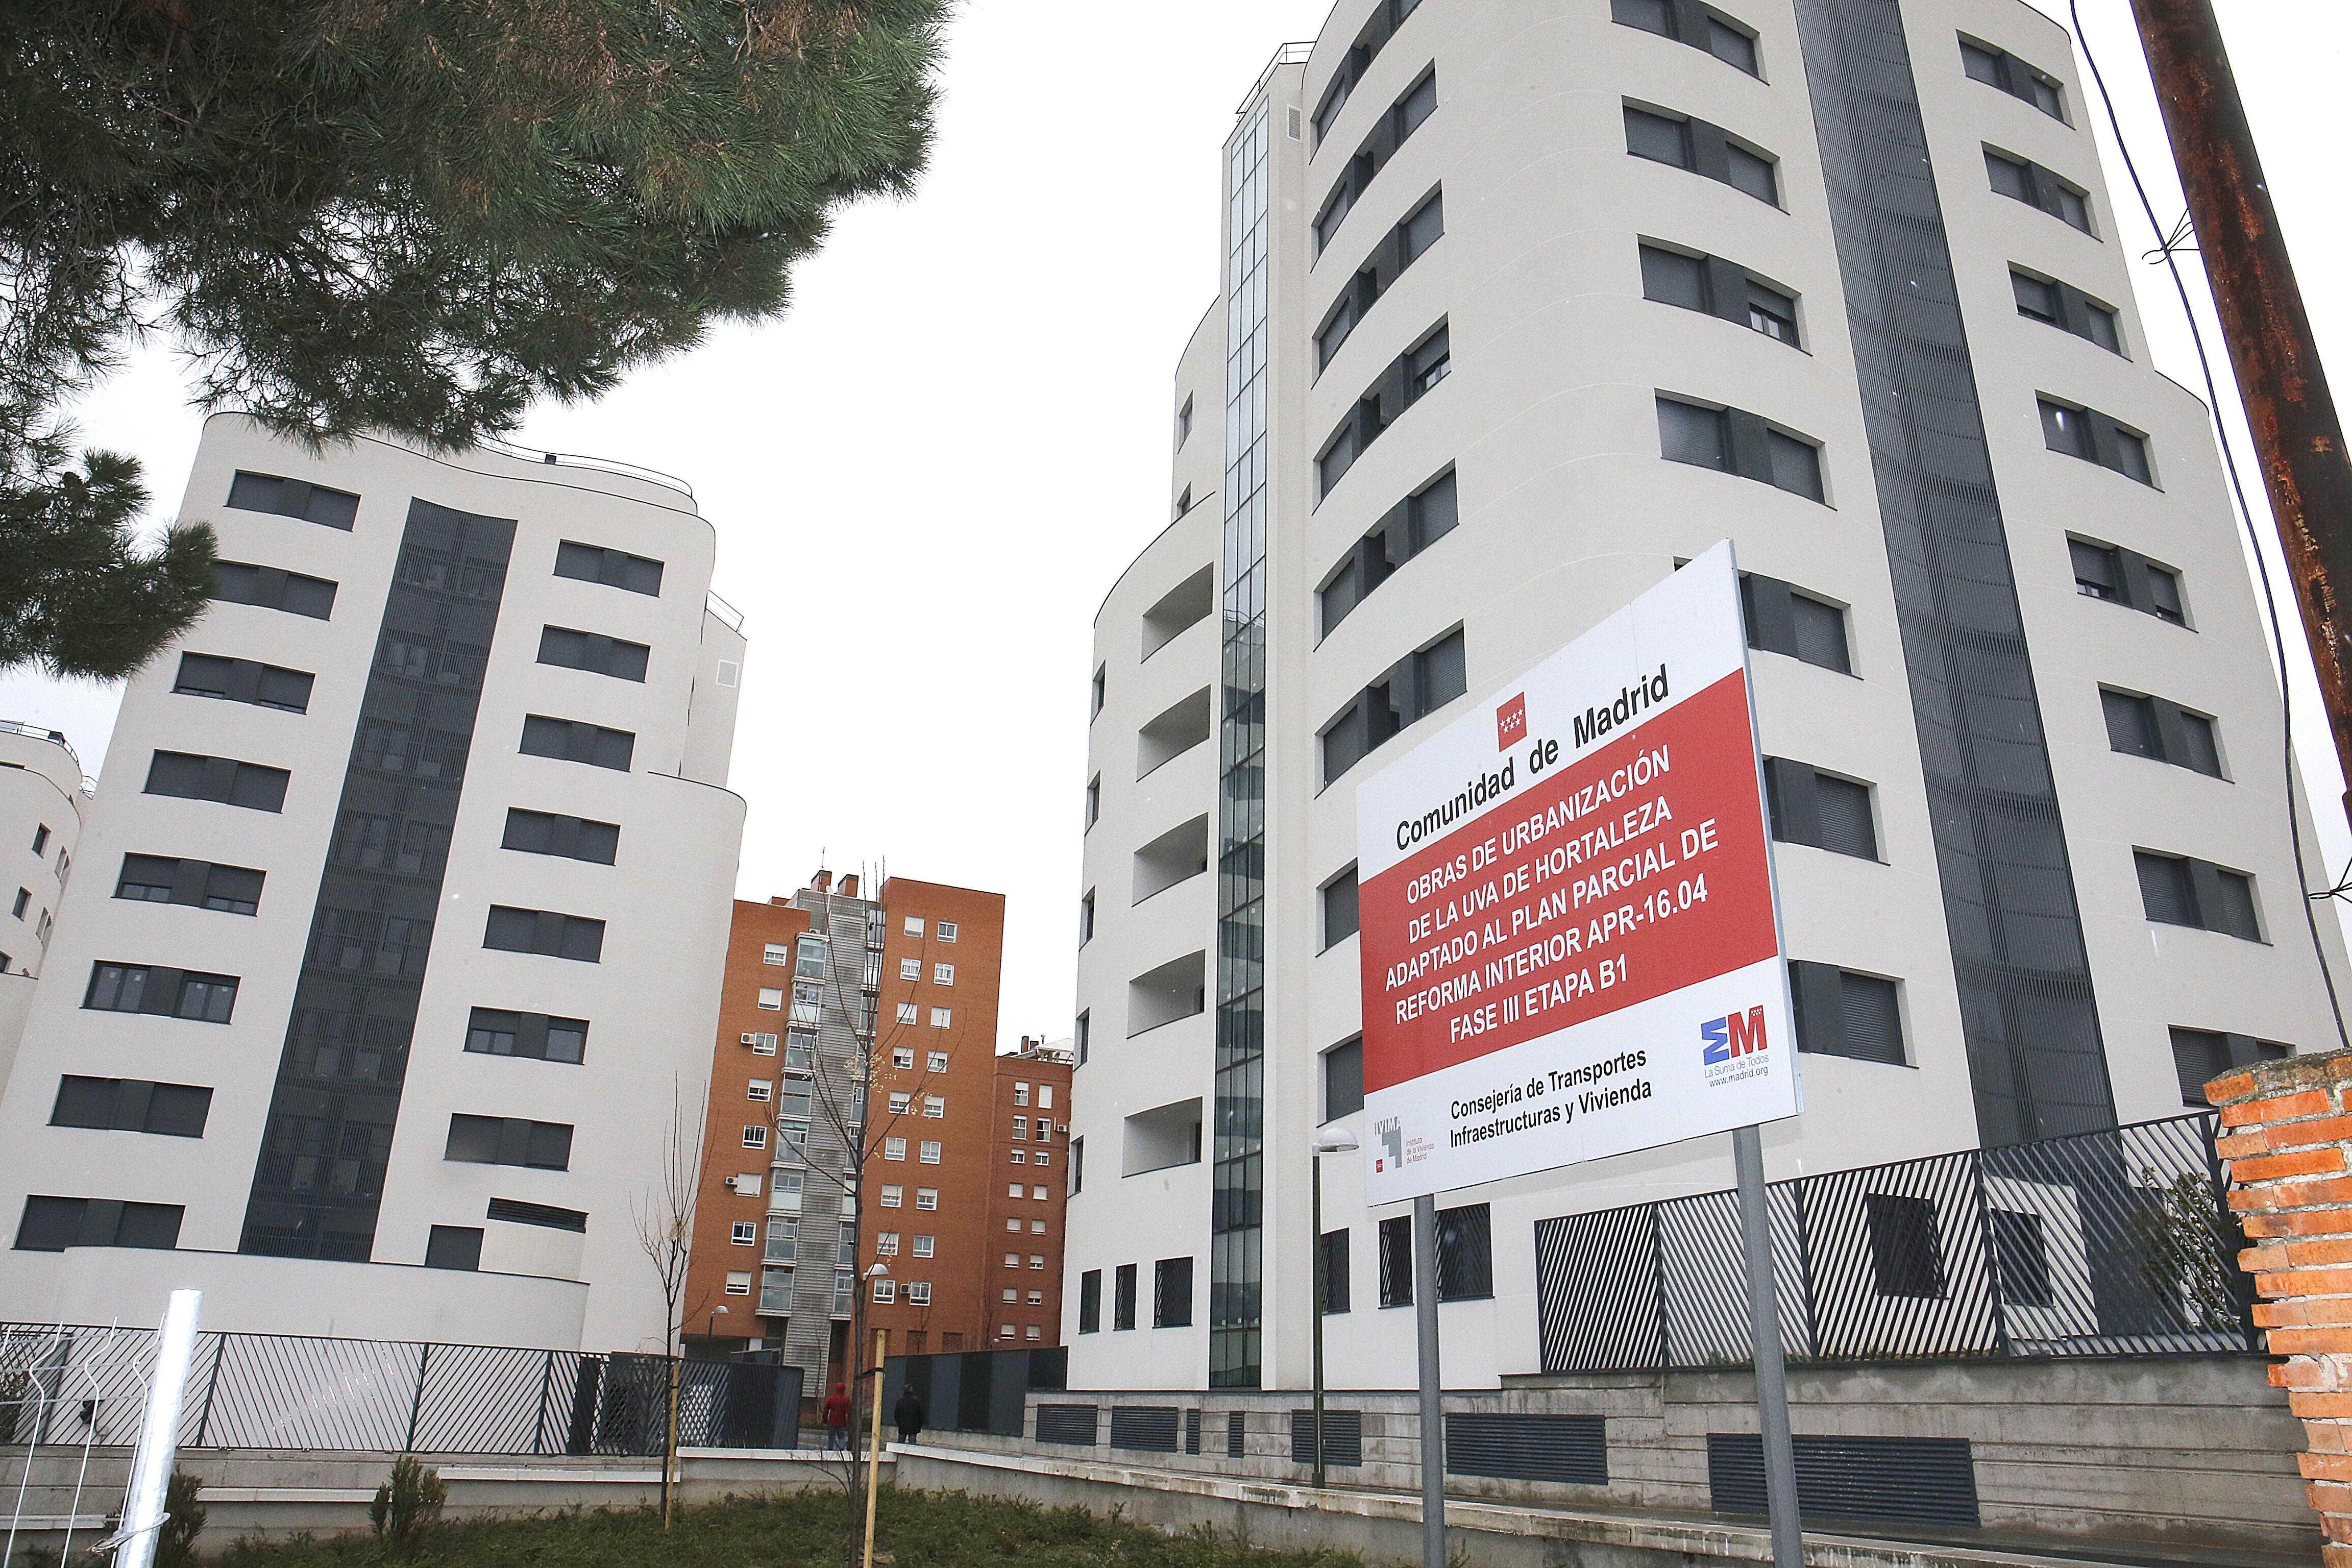 Zona retiro alquiler de pisos sociales en madrid por 36 for Pisos com madrid